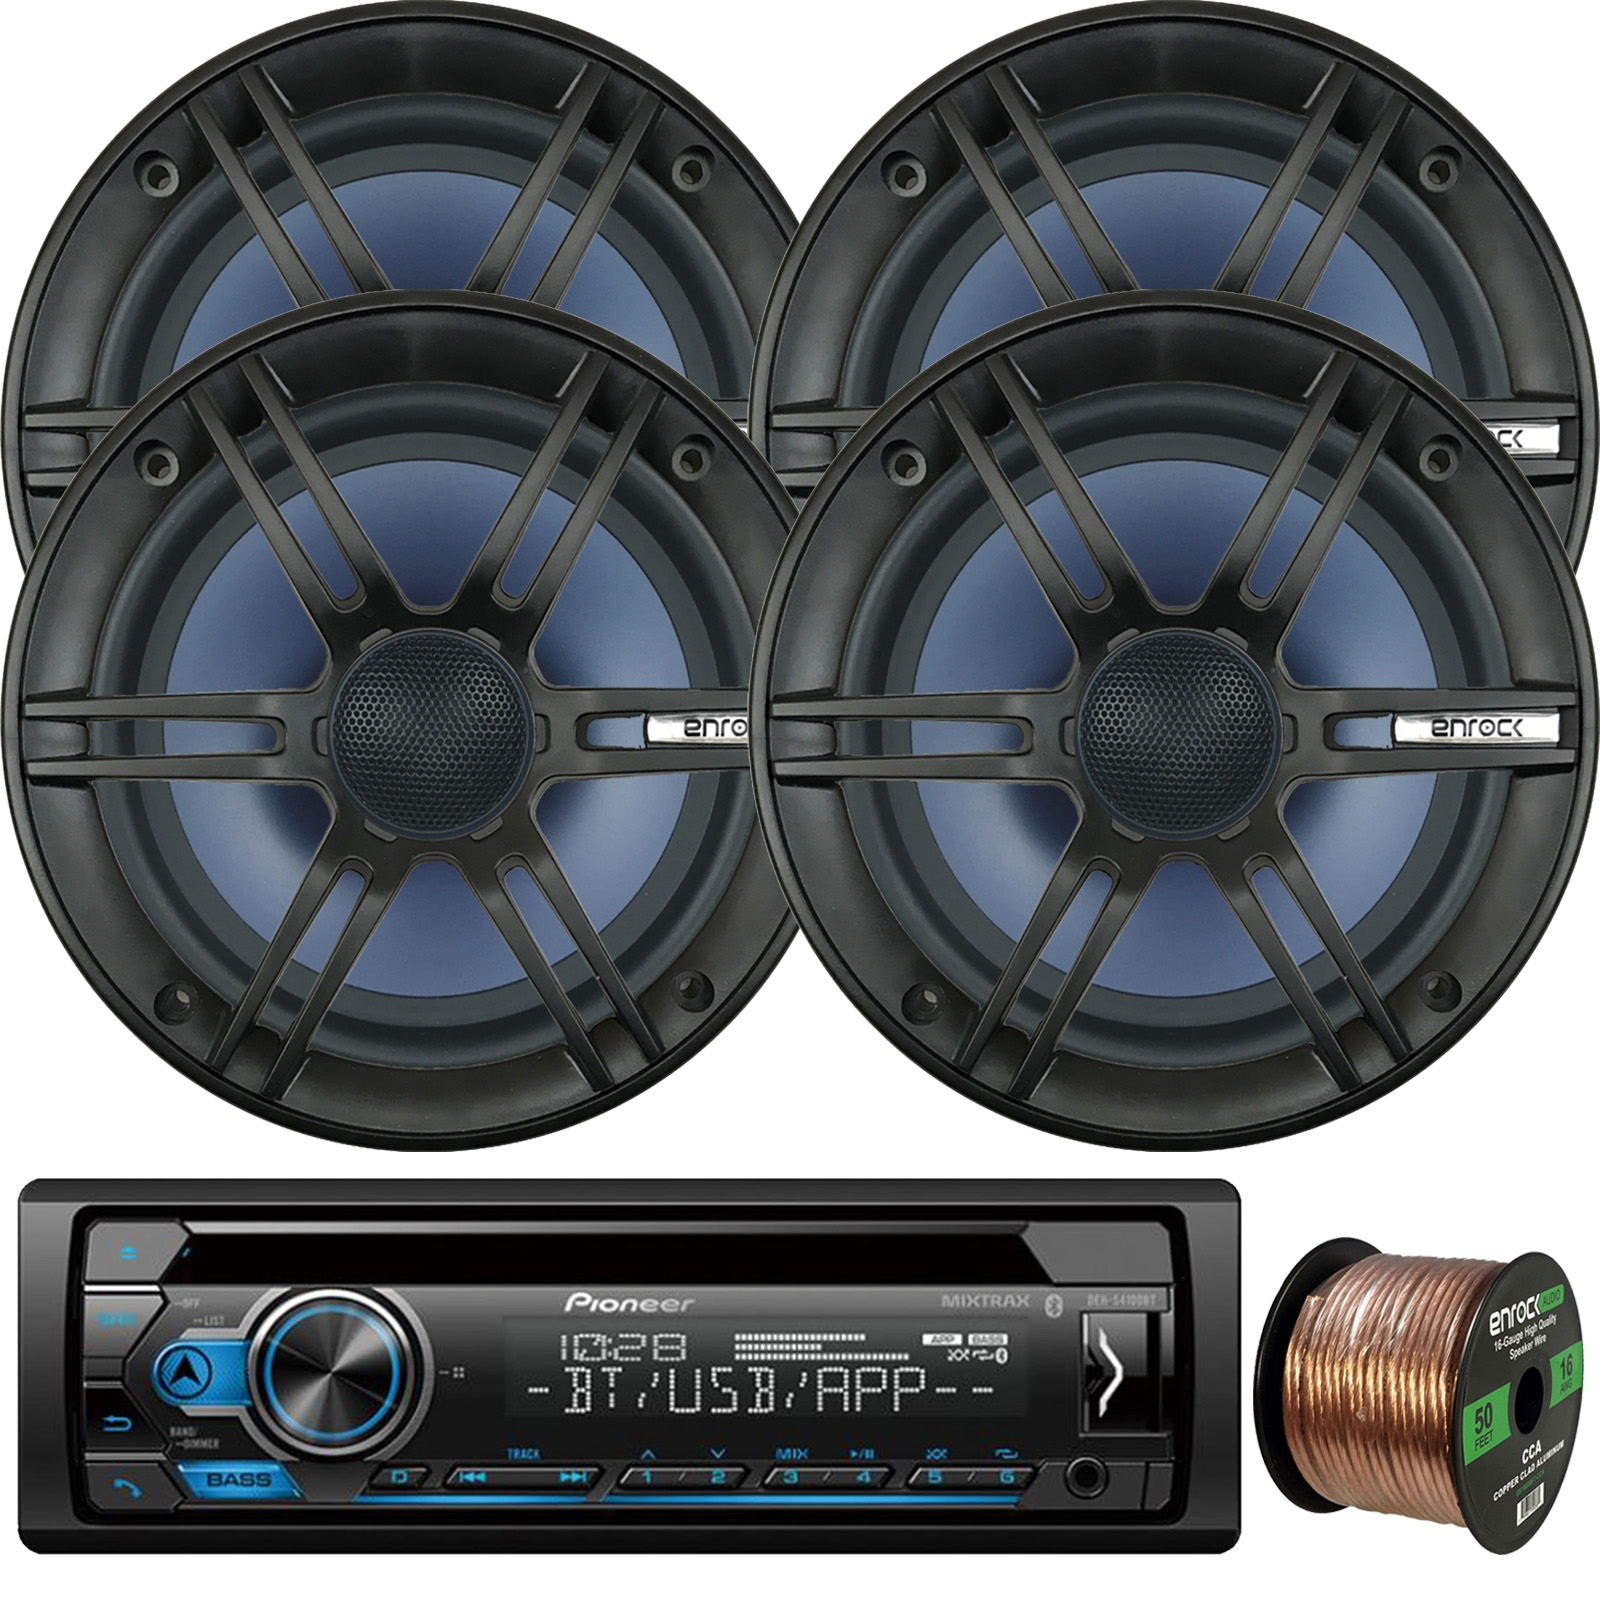 "Pioneer DEH-S4100BT In-Dash Single-DIN CD Player Bluetooth Receiver, 4 x Enrock Audio 6.5"" 2-Way Marine-Grade Coaxial Car/Boat Audio Stereo Speakers, 16-Gauge 50Ft. Speaker Wire"